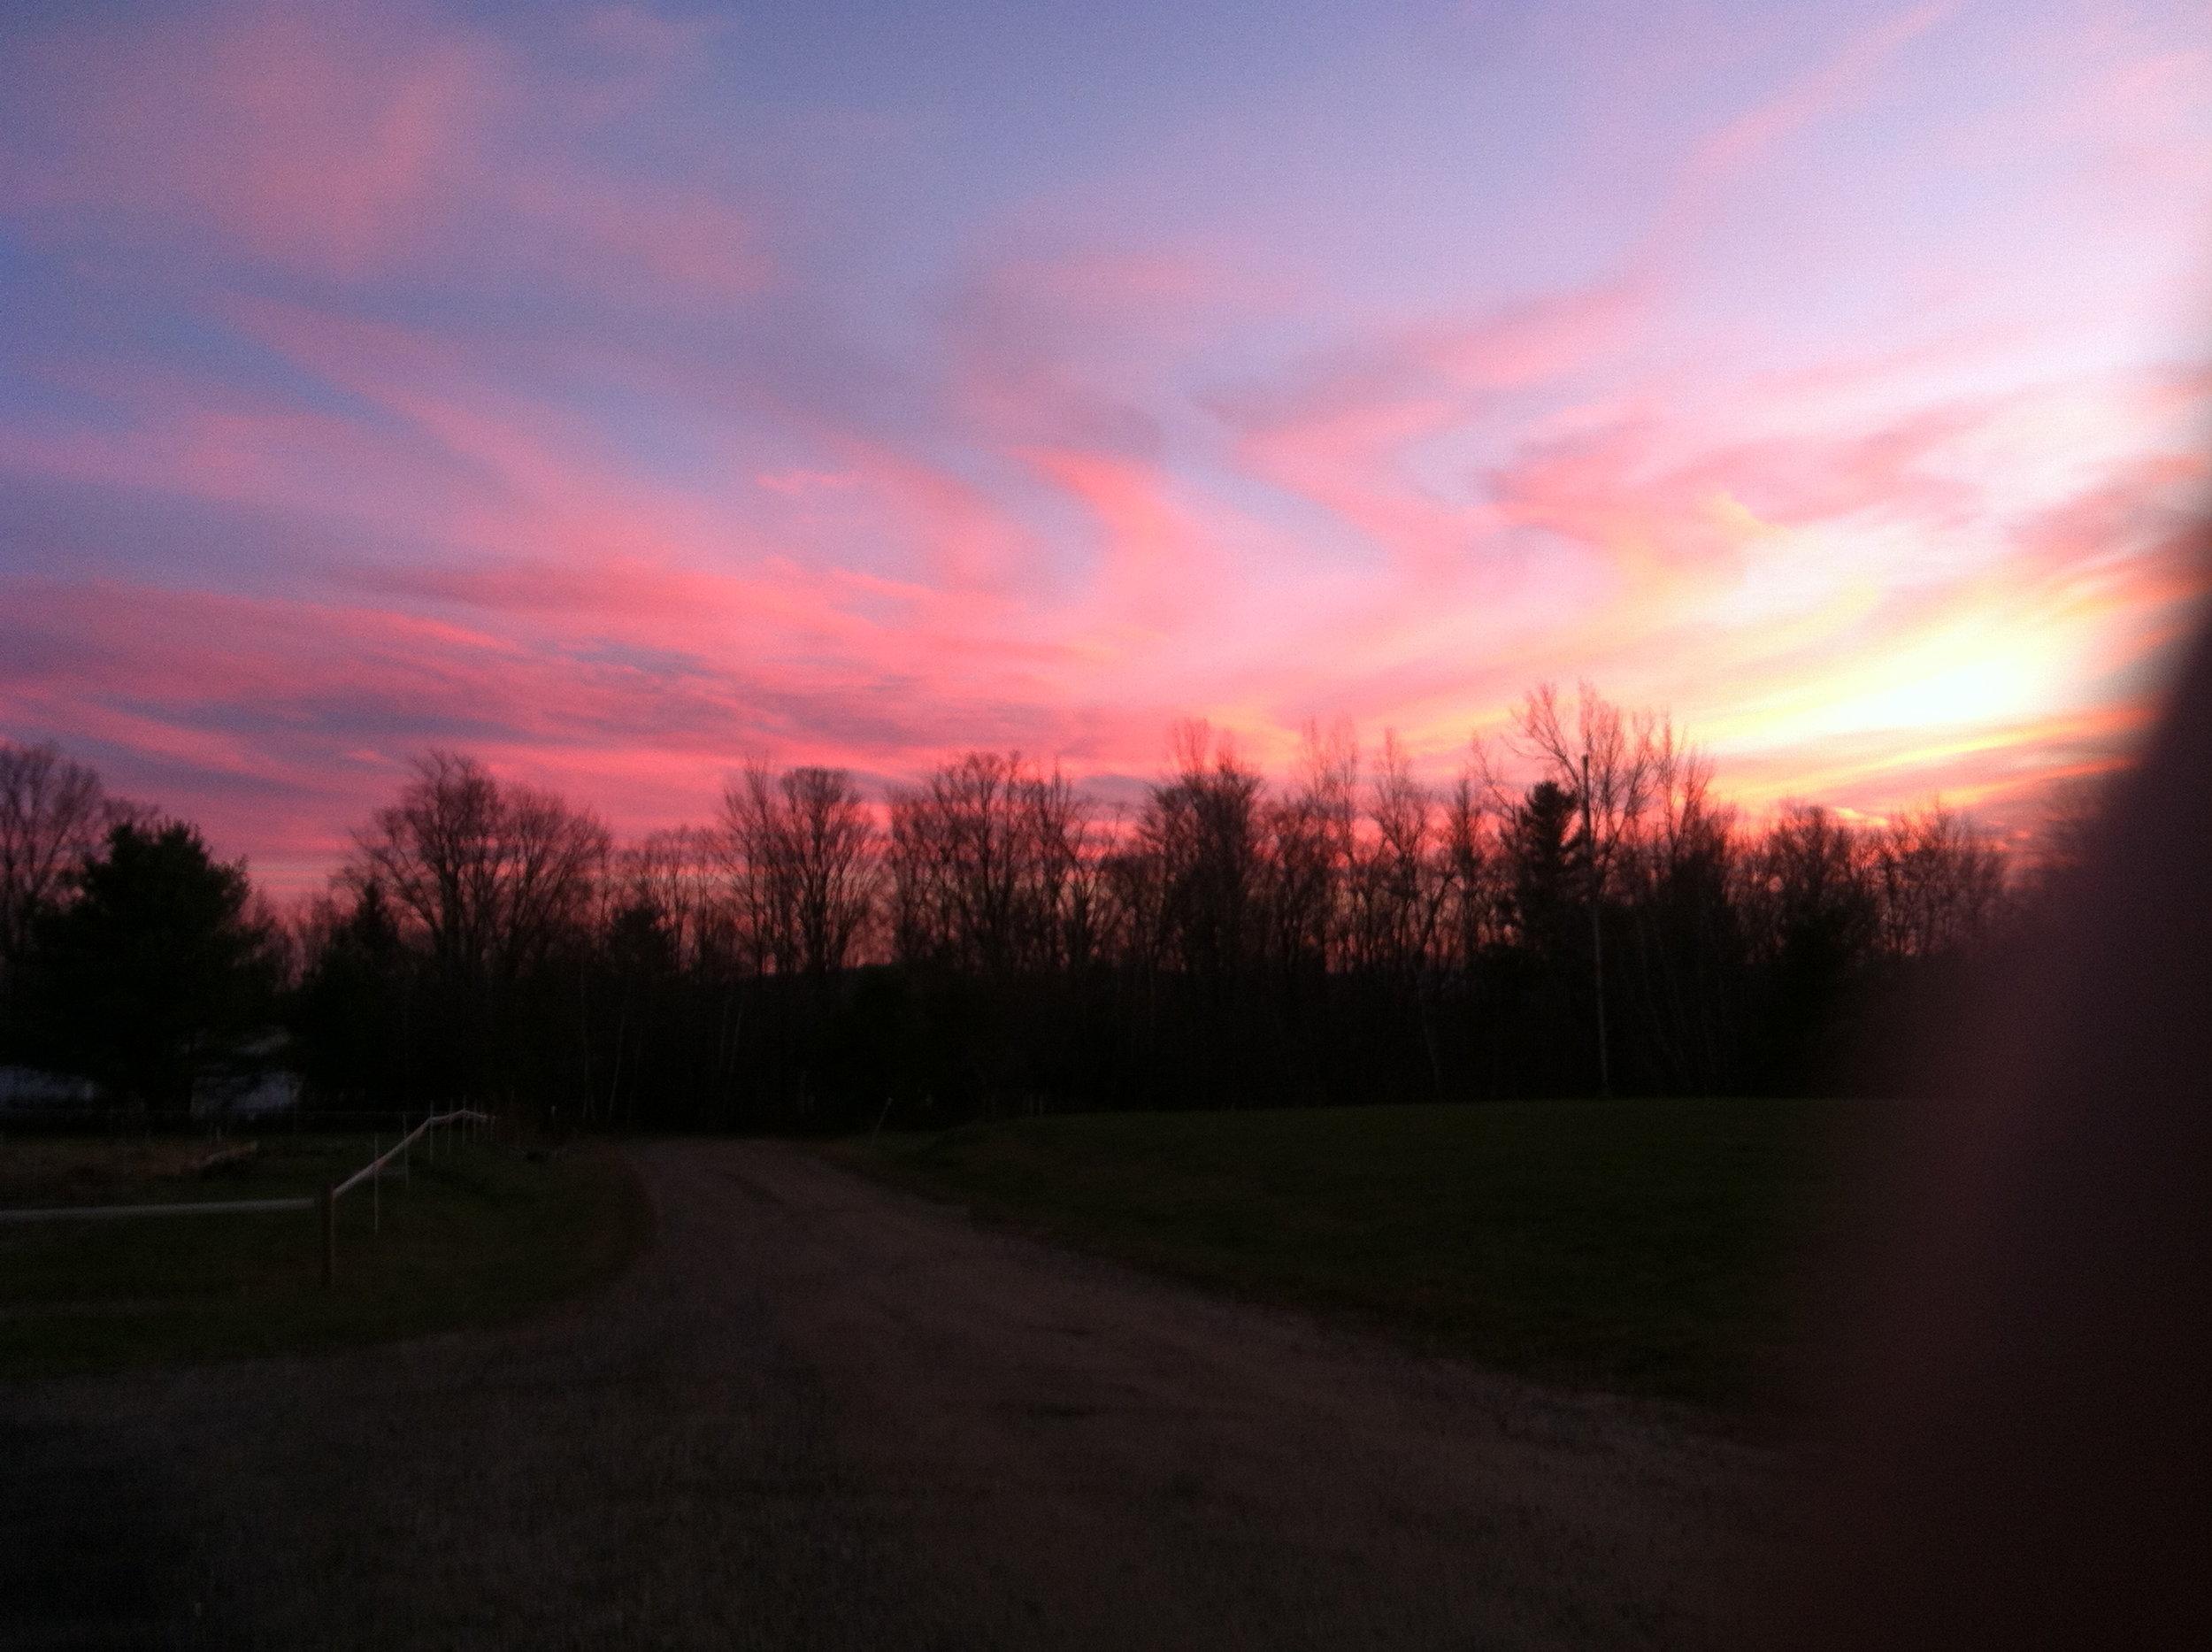 New England's beauty: a fall sunset